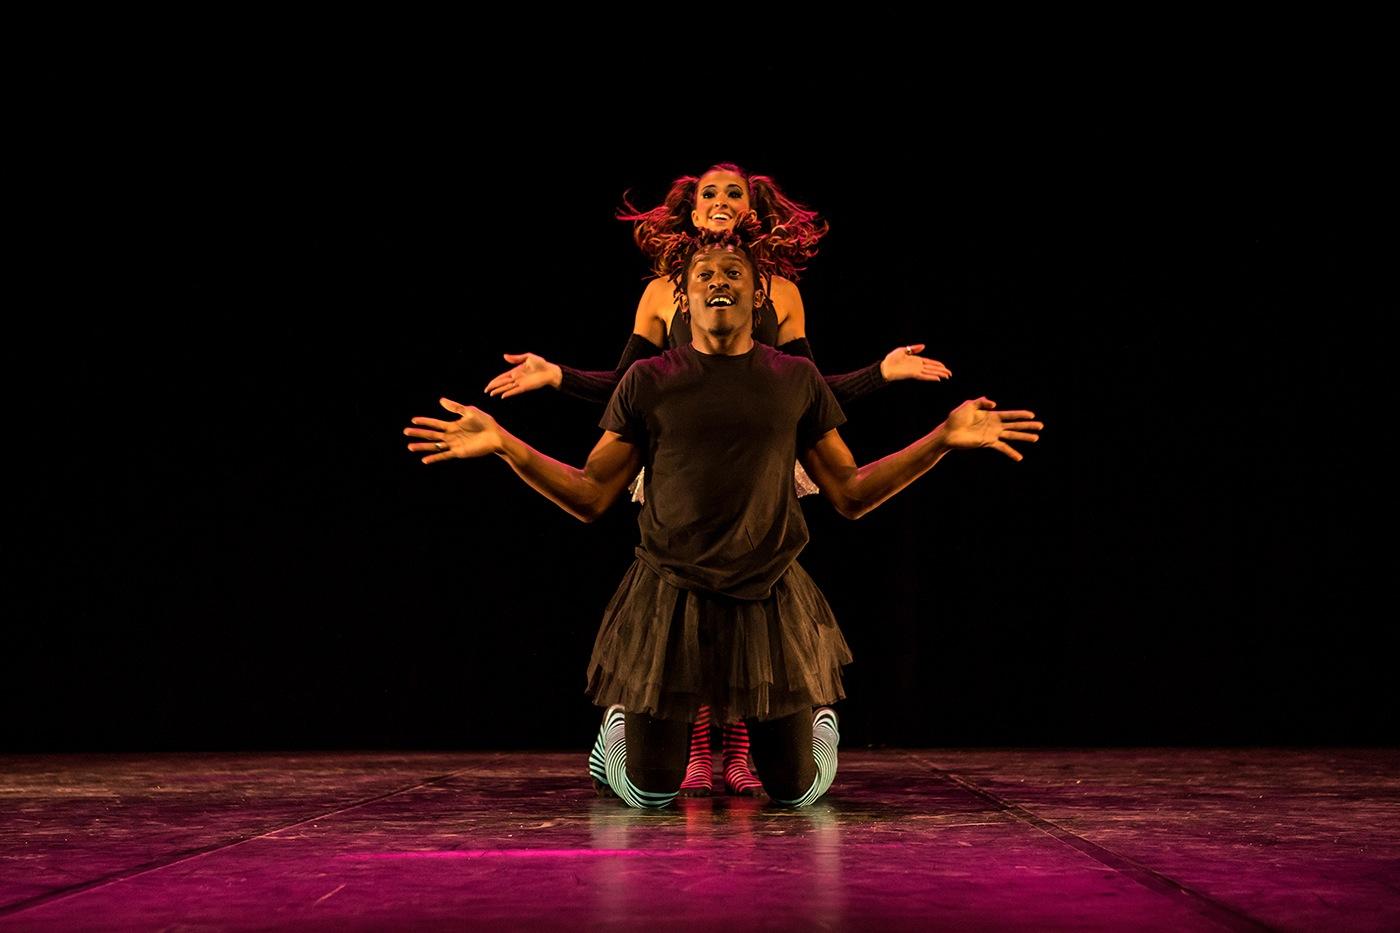 photographe-reportage-danse-avec-ton-crous-guillaume-heraud-027-small